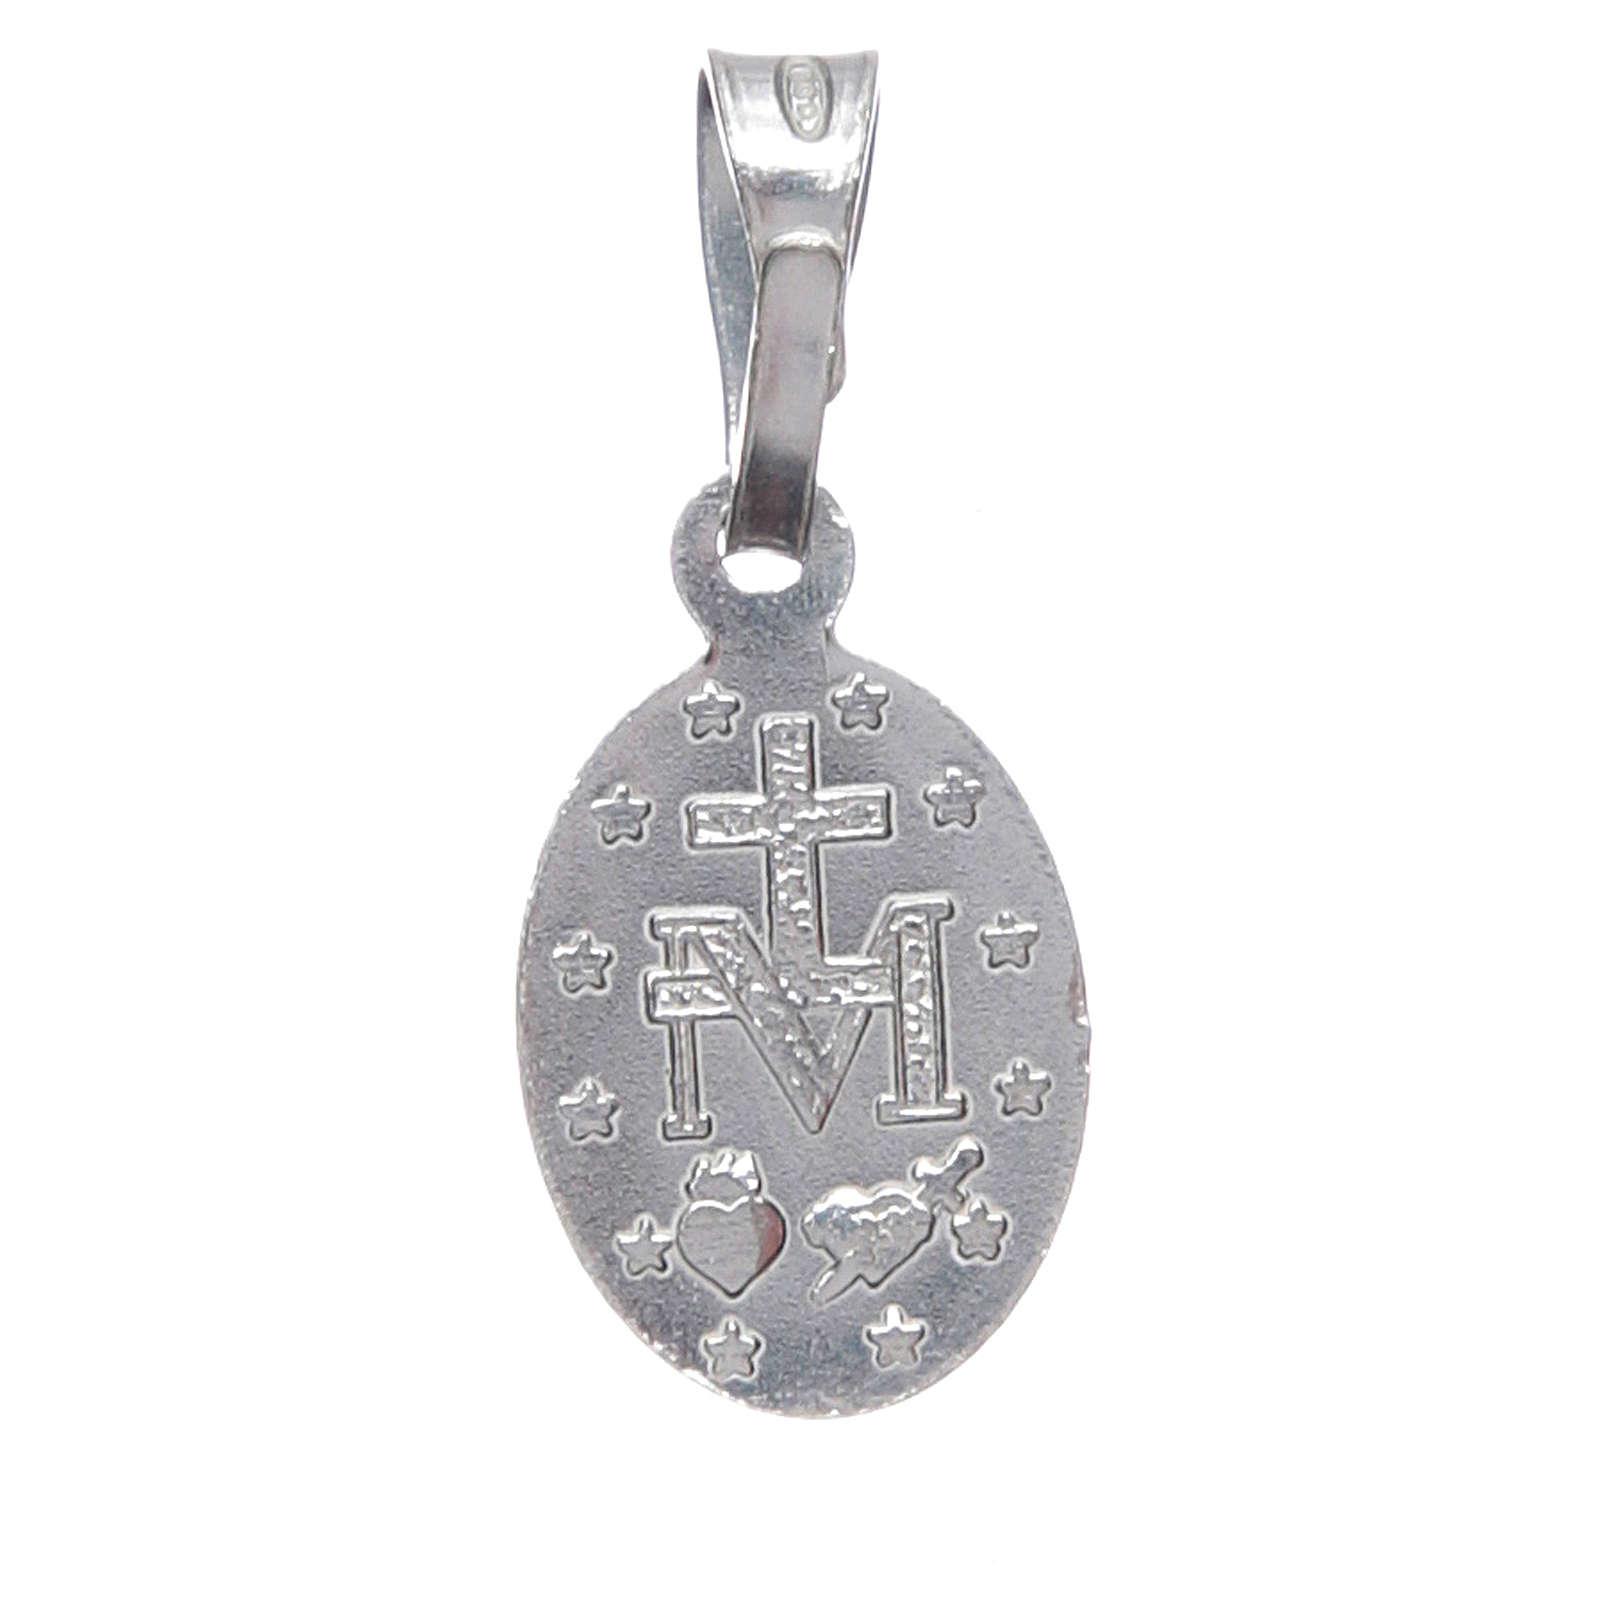 Medaille wundertätig Silber 925 h. 1 cm 4